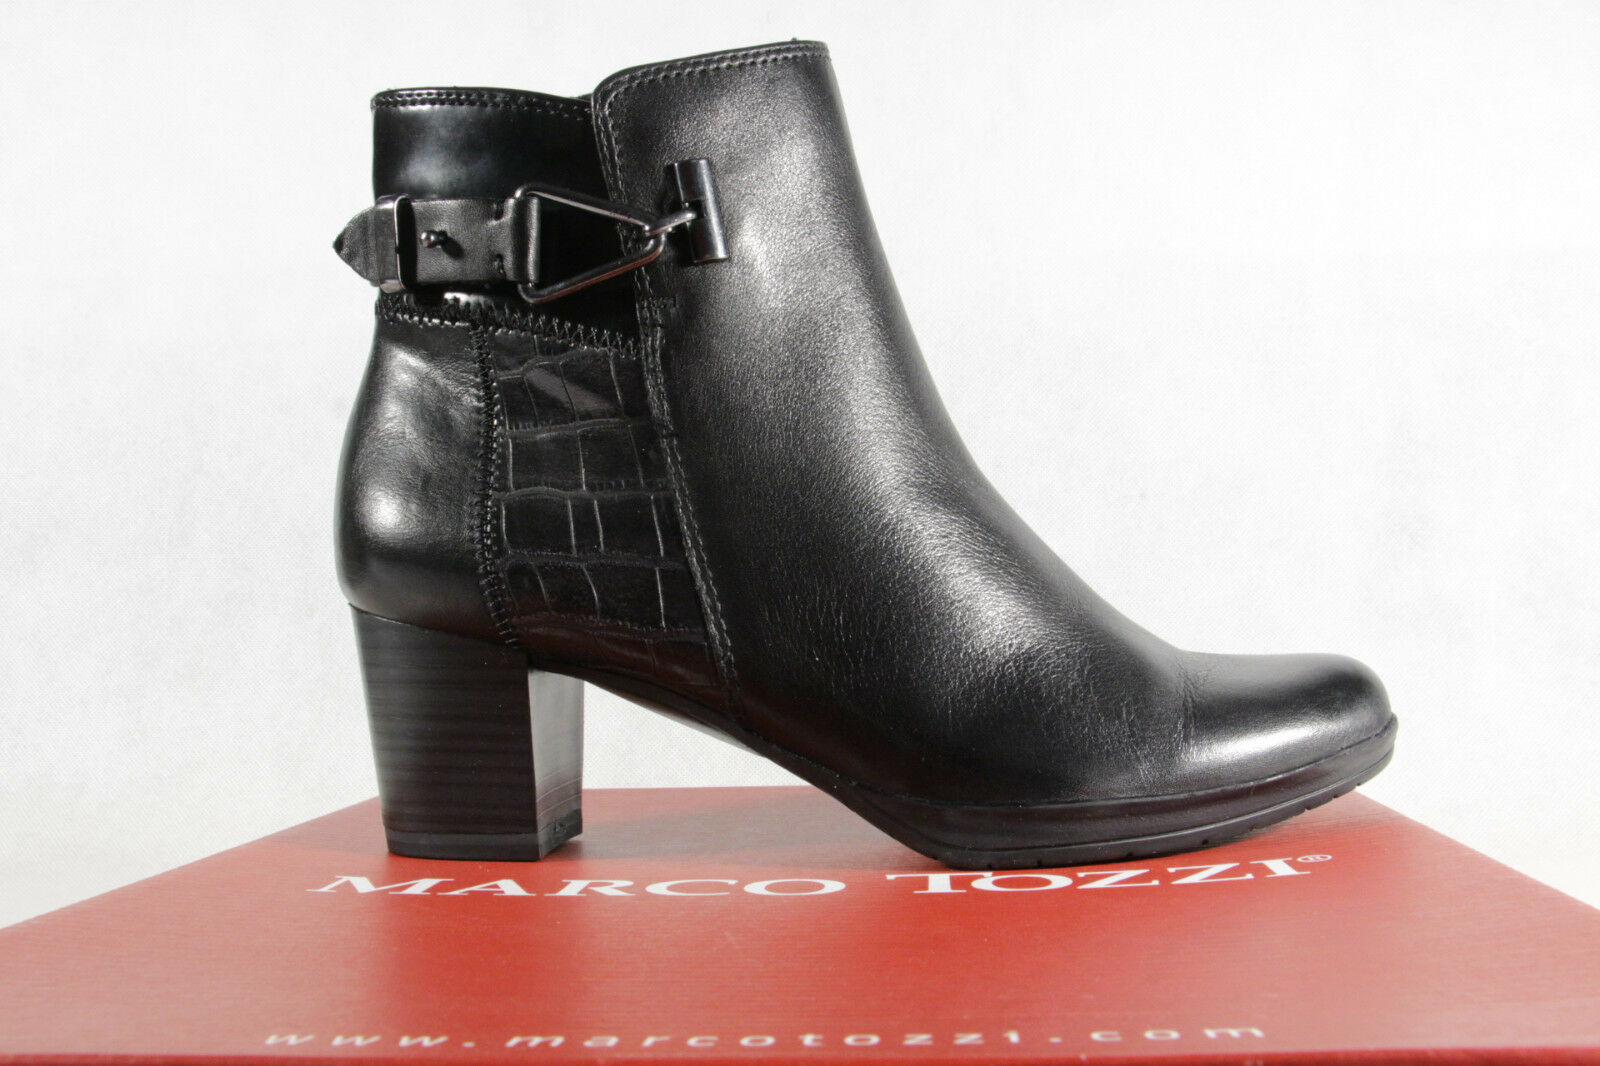 Marco Leder Tozzi Stiefelette Stiefel, schwarz, Leder Marco 25385  NEU 782cb9